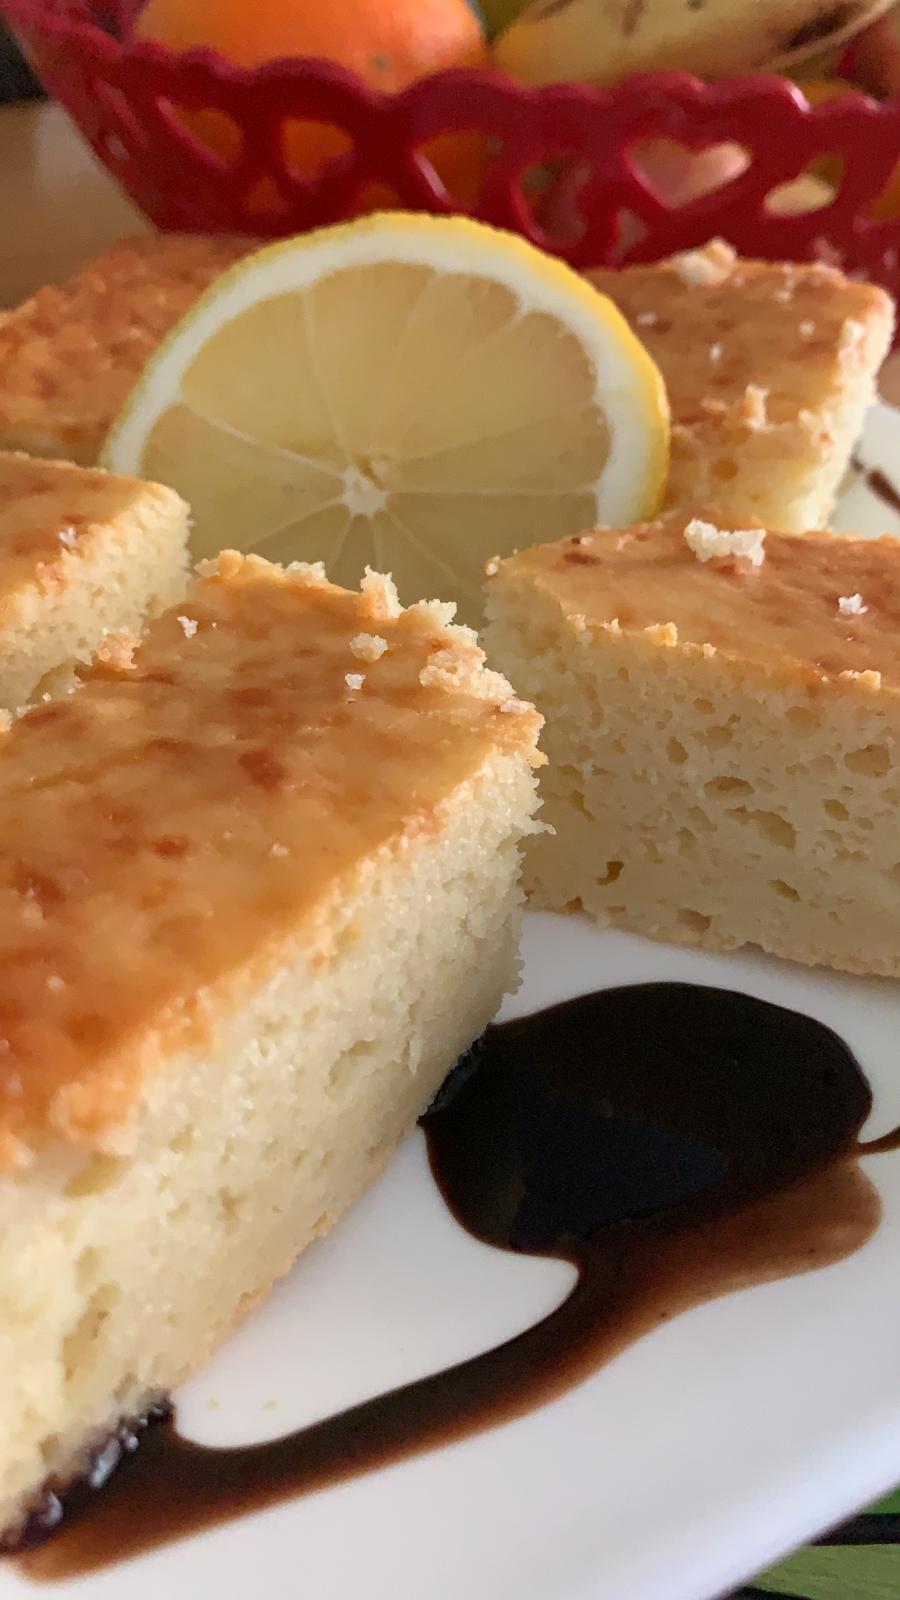 cid  1680e37b1d2652642591  1 - עוגת גבינה לימונית מהירה בחושה